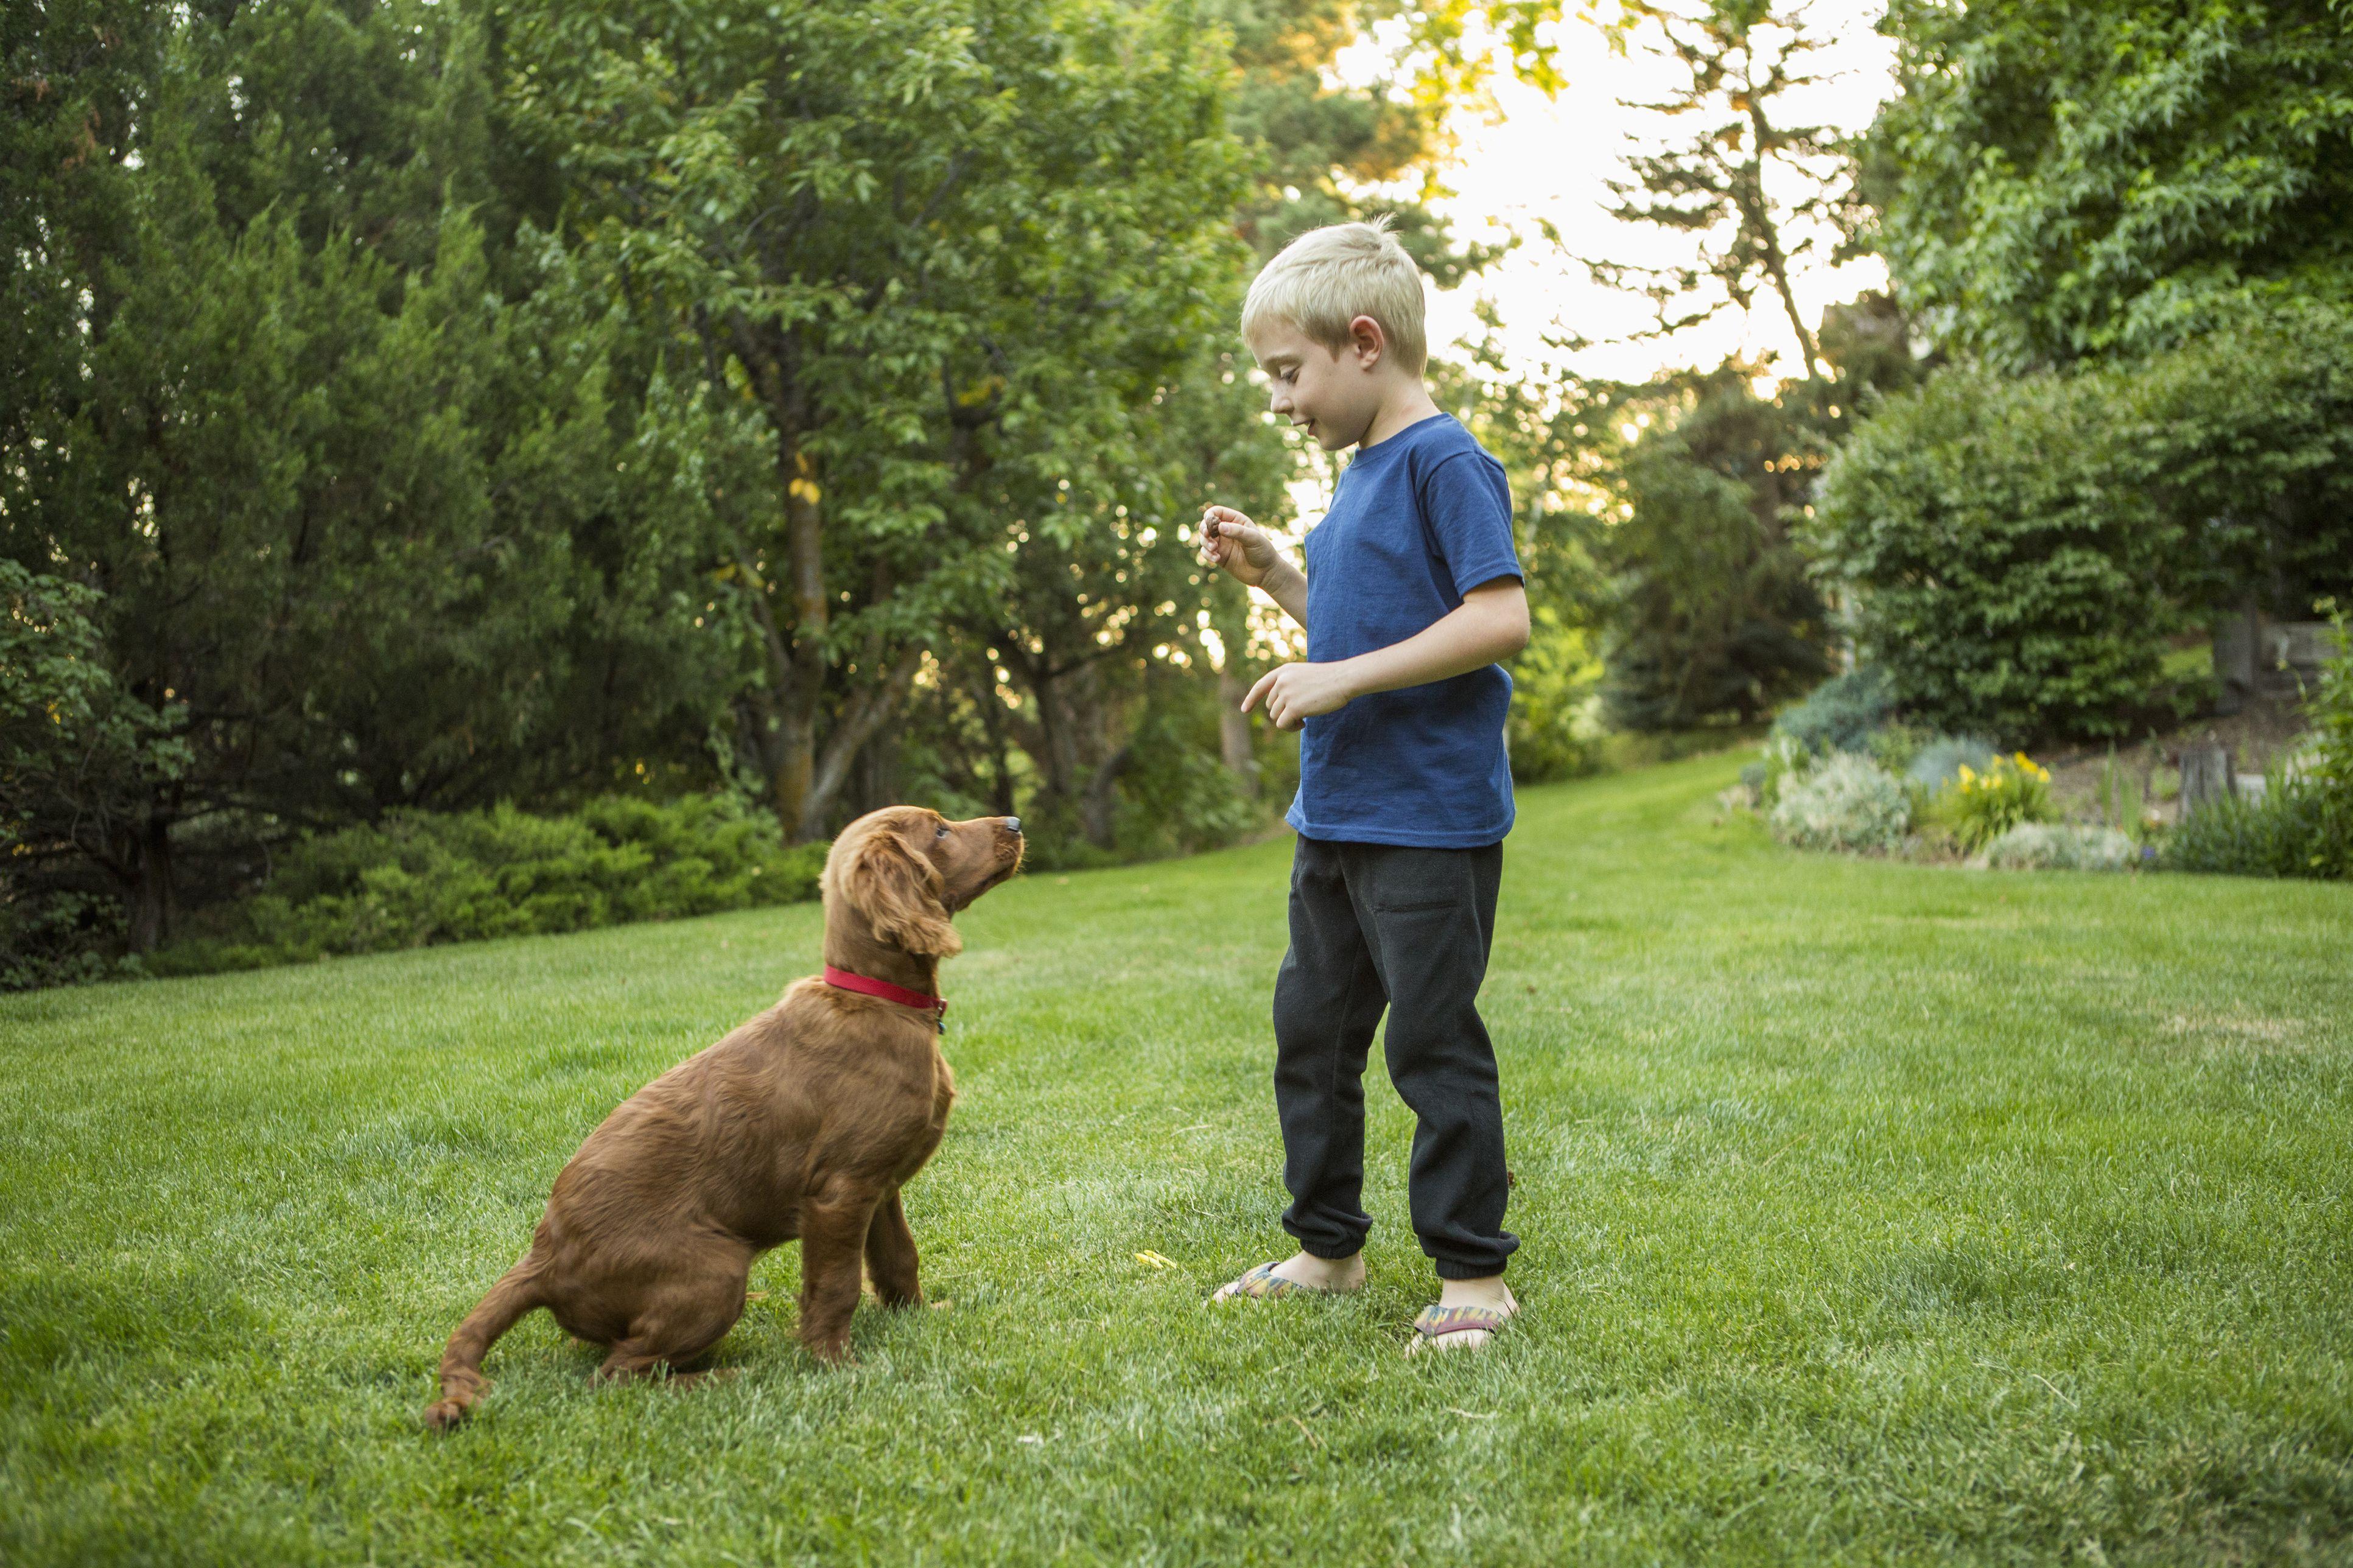 Caucasian Boy Training Dog in Grass